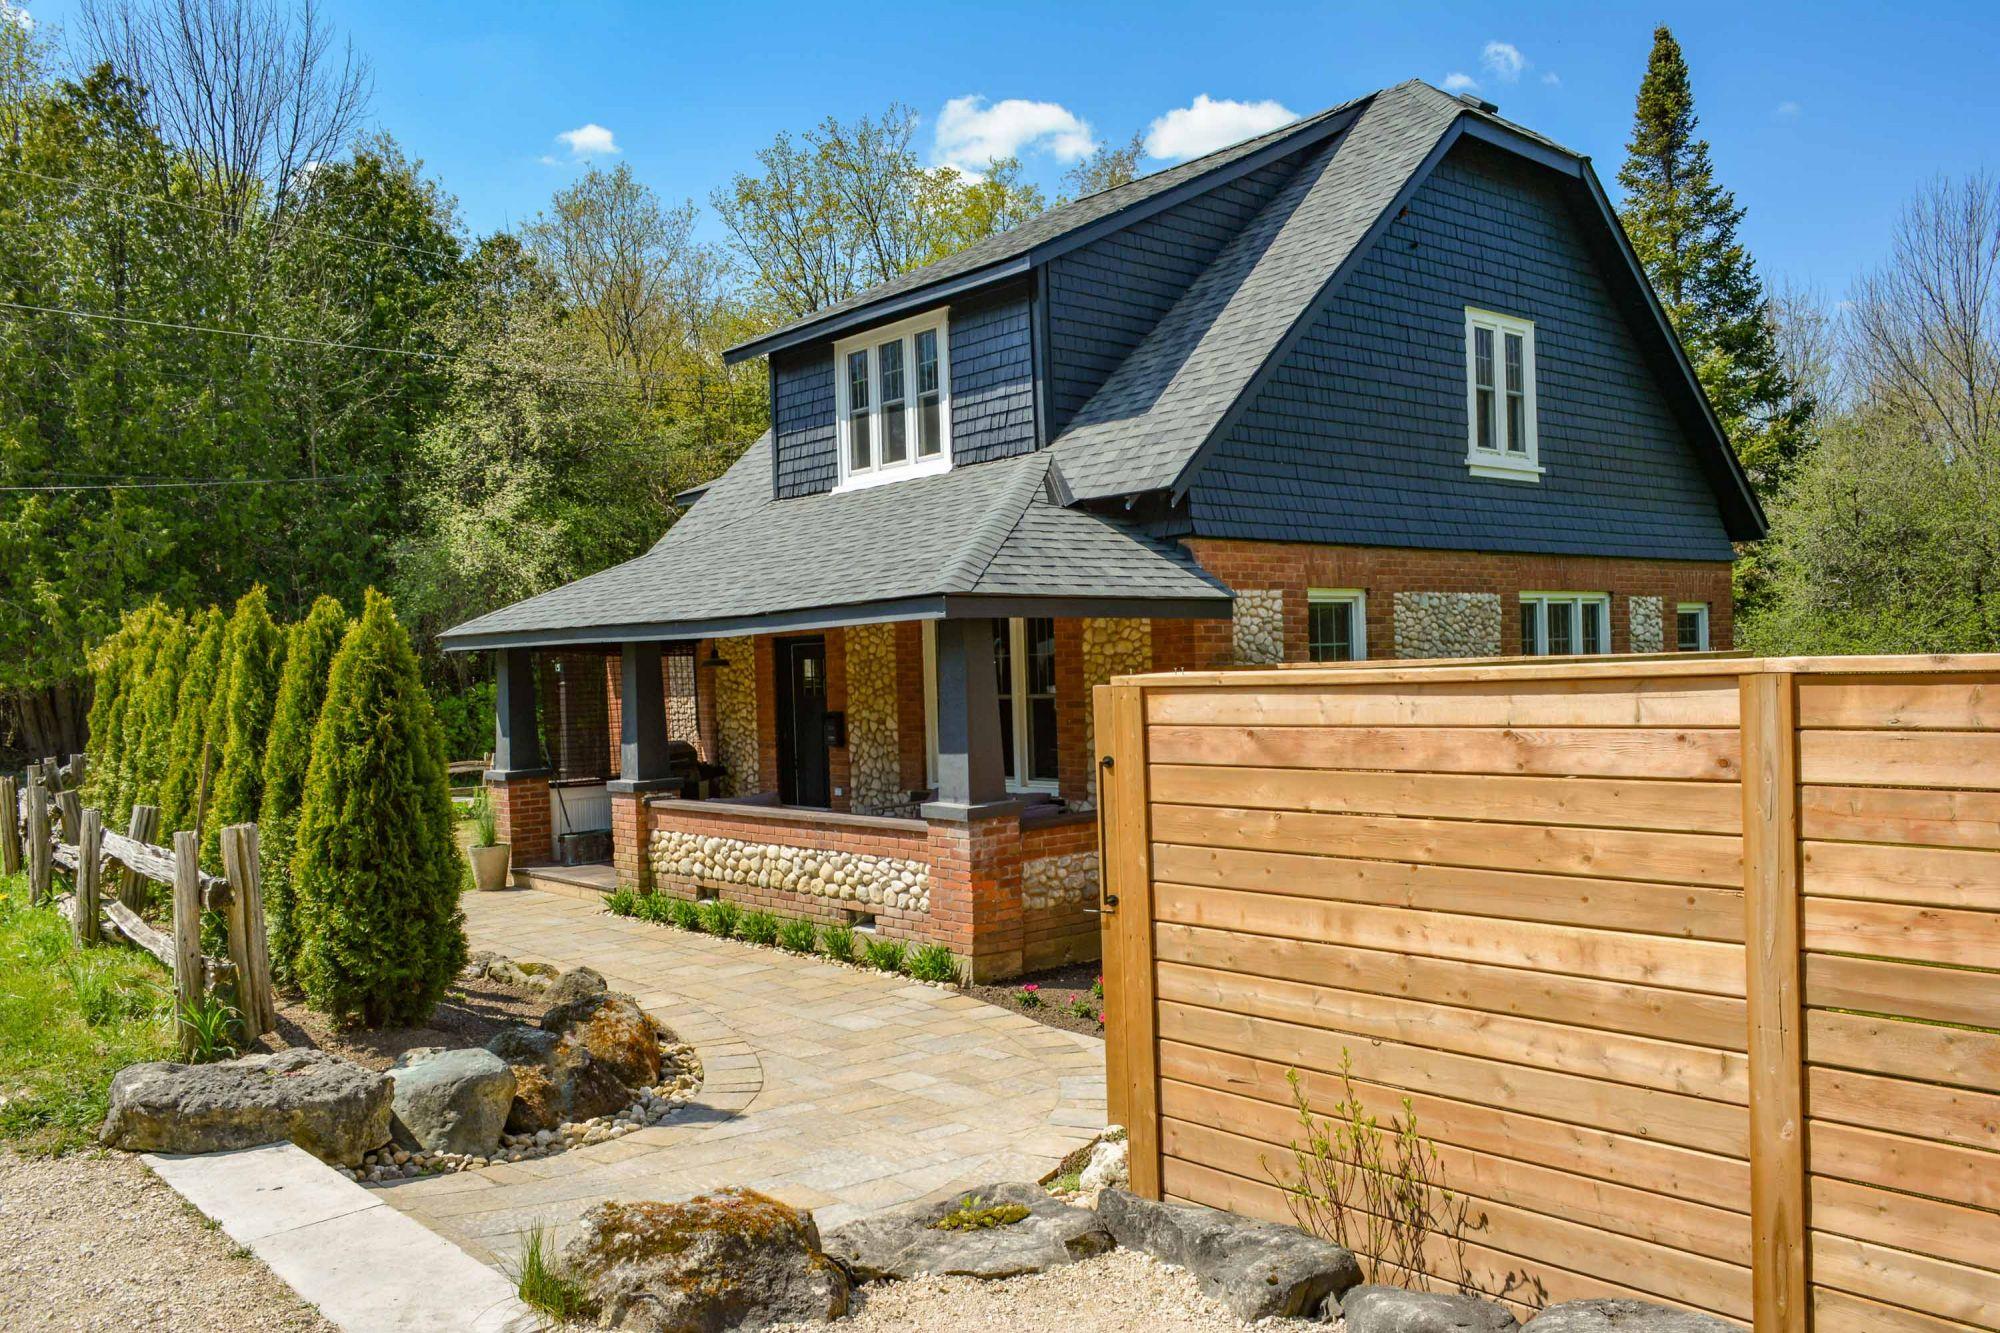 Charming Craftsman Brick & River Stone Cottage